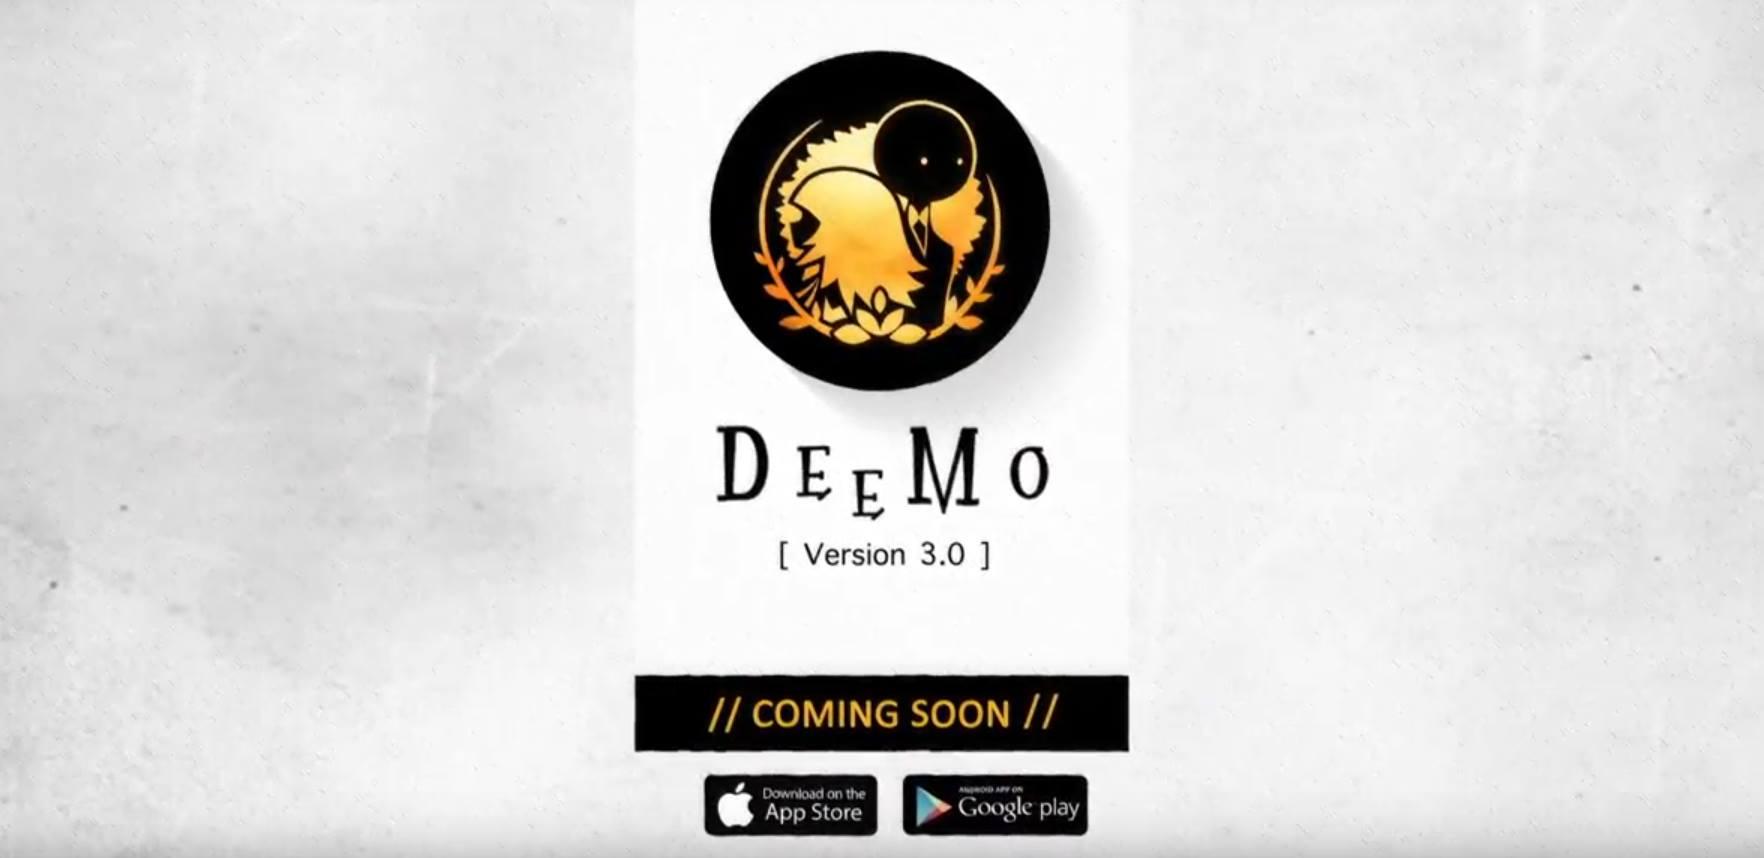 DEEMO 3.0